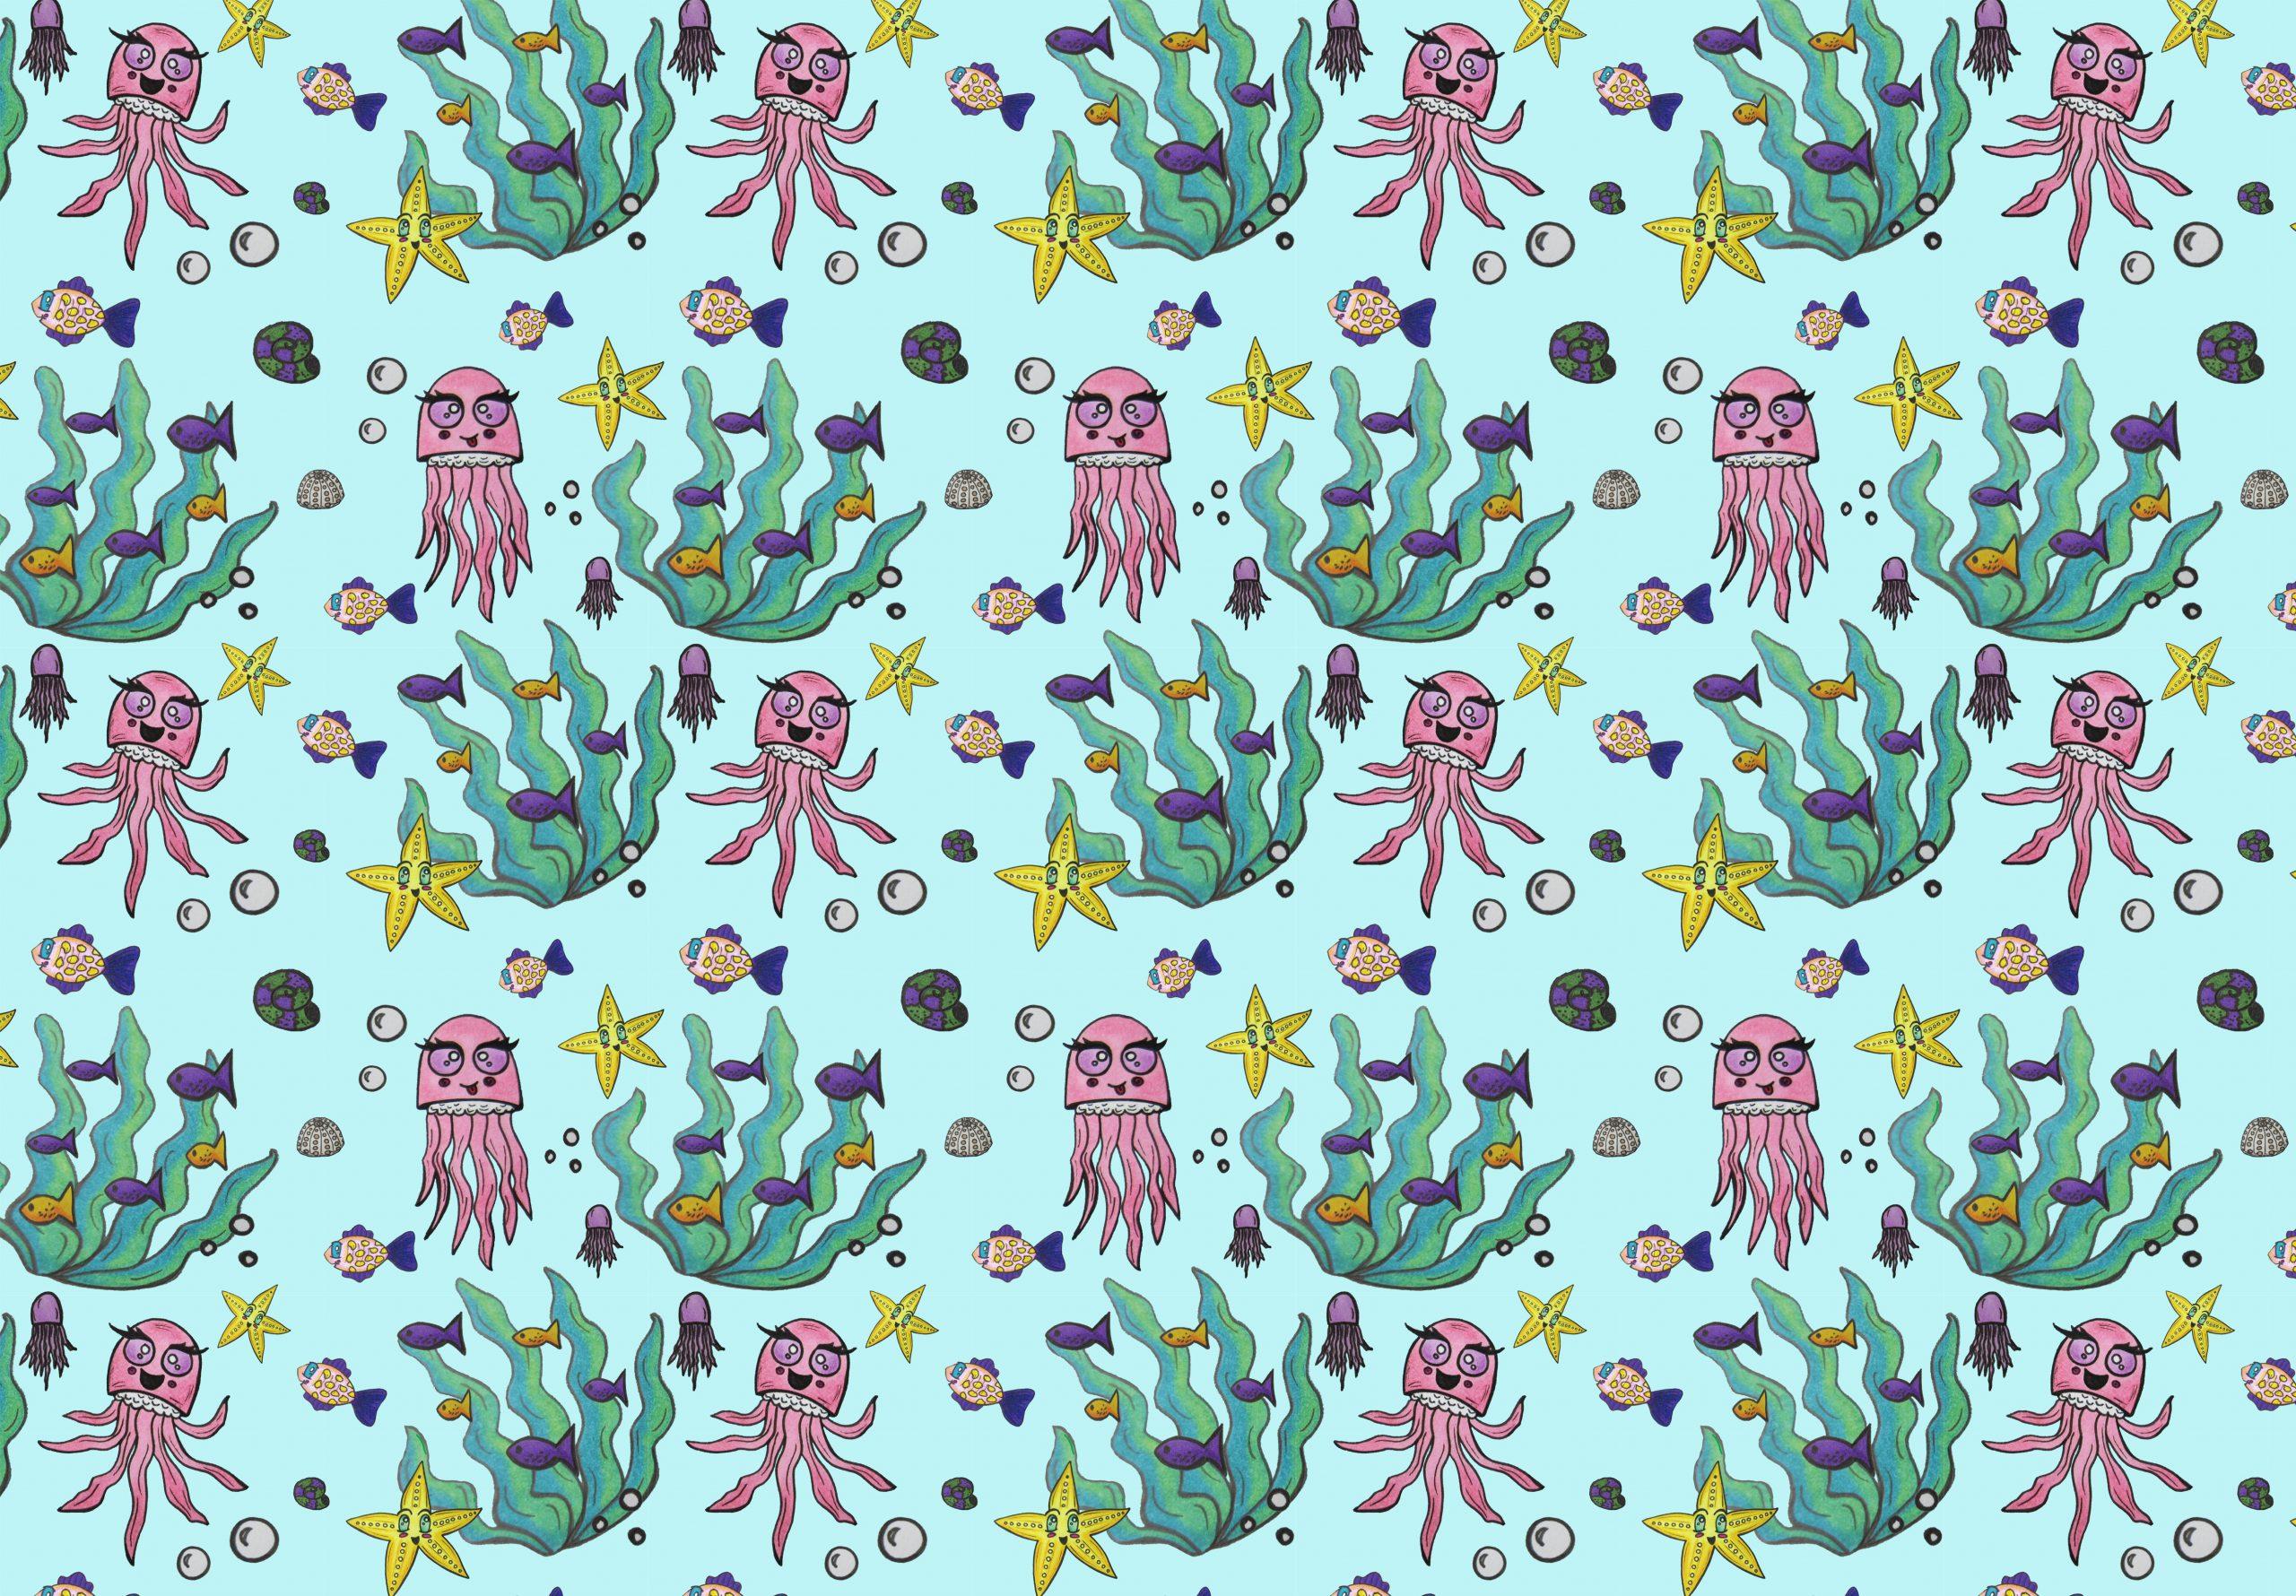 Pattern de medusas